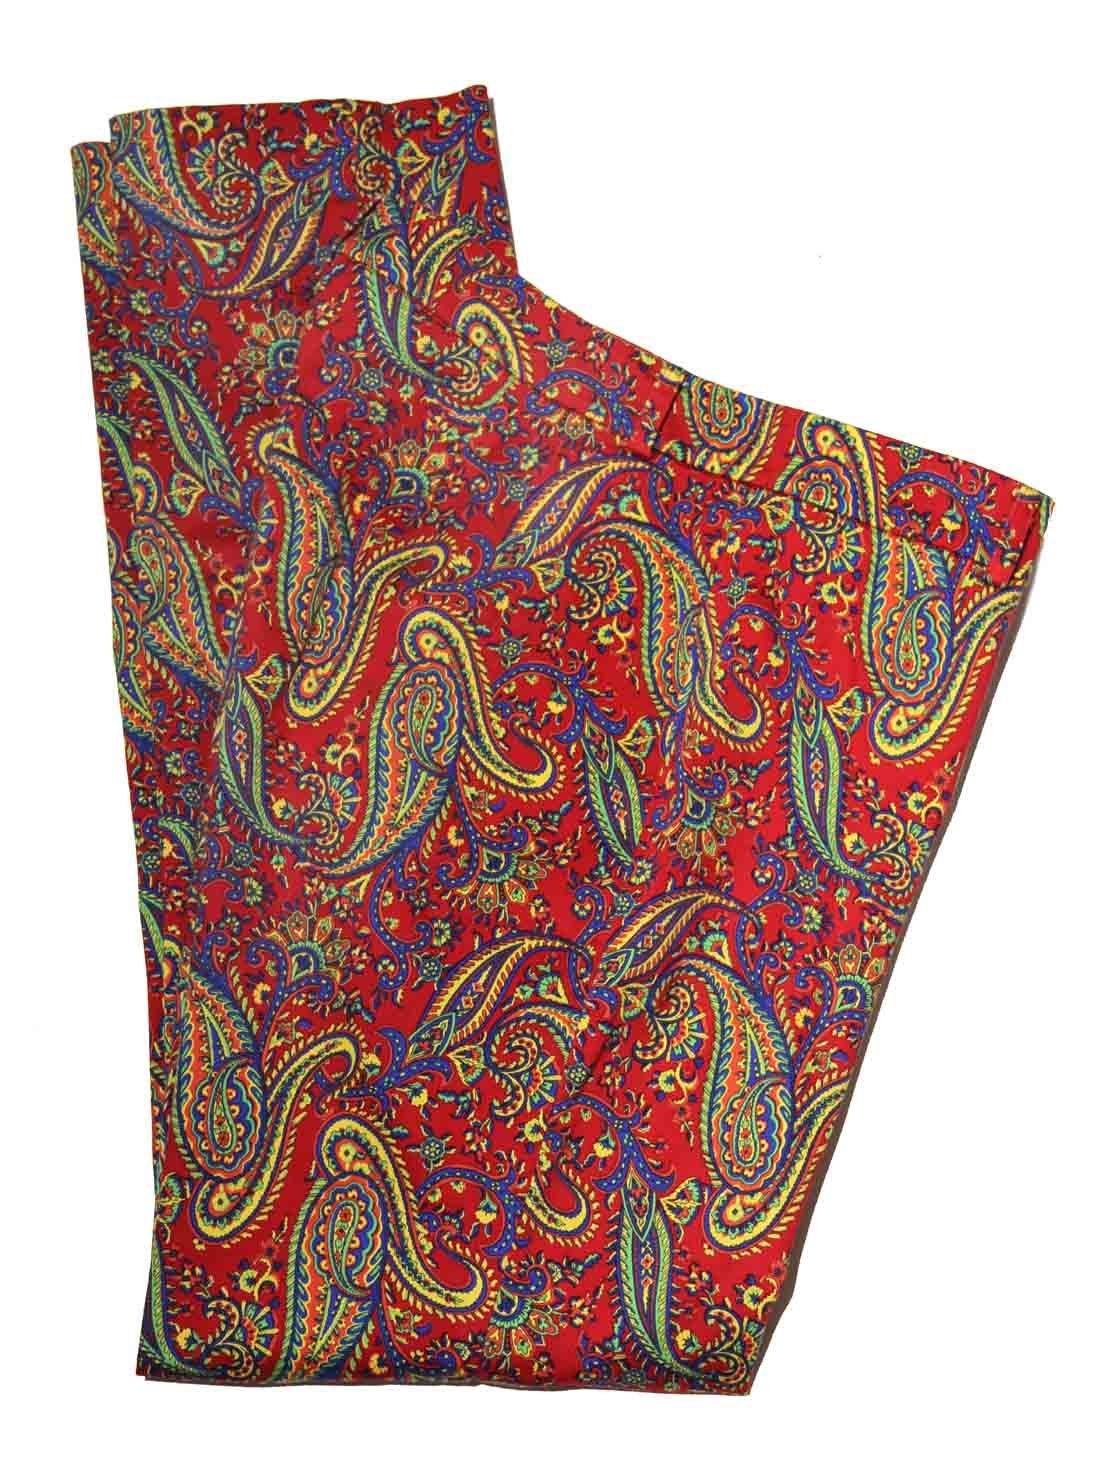 Ralph Lauren Paisley Pants Red Green Blue Yellow Orange Women's Size 8